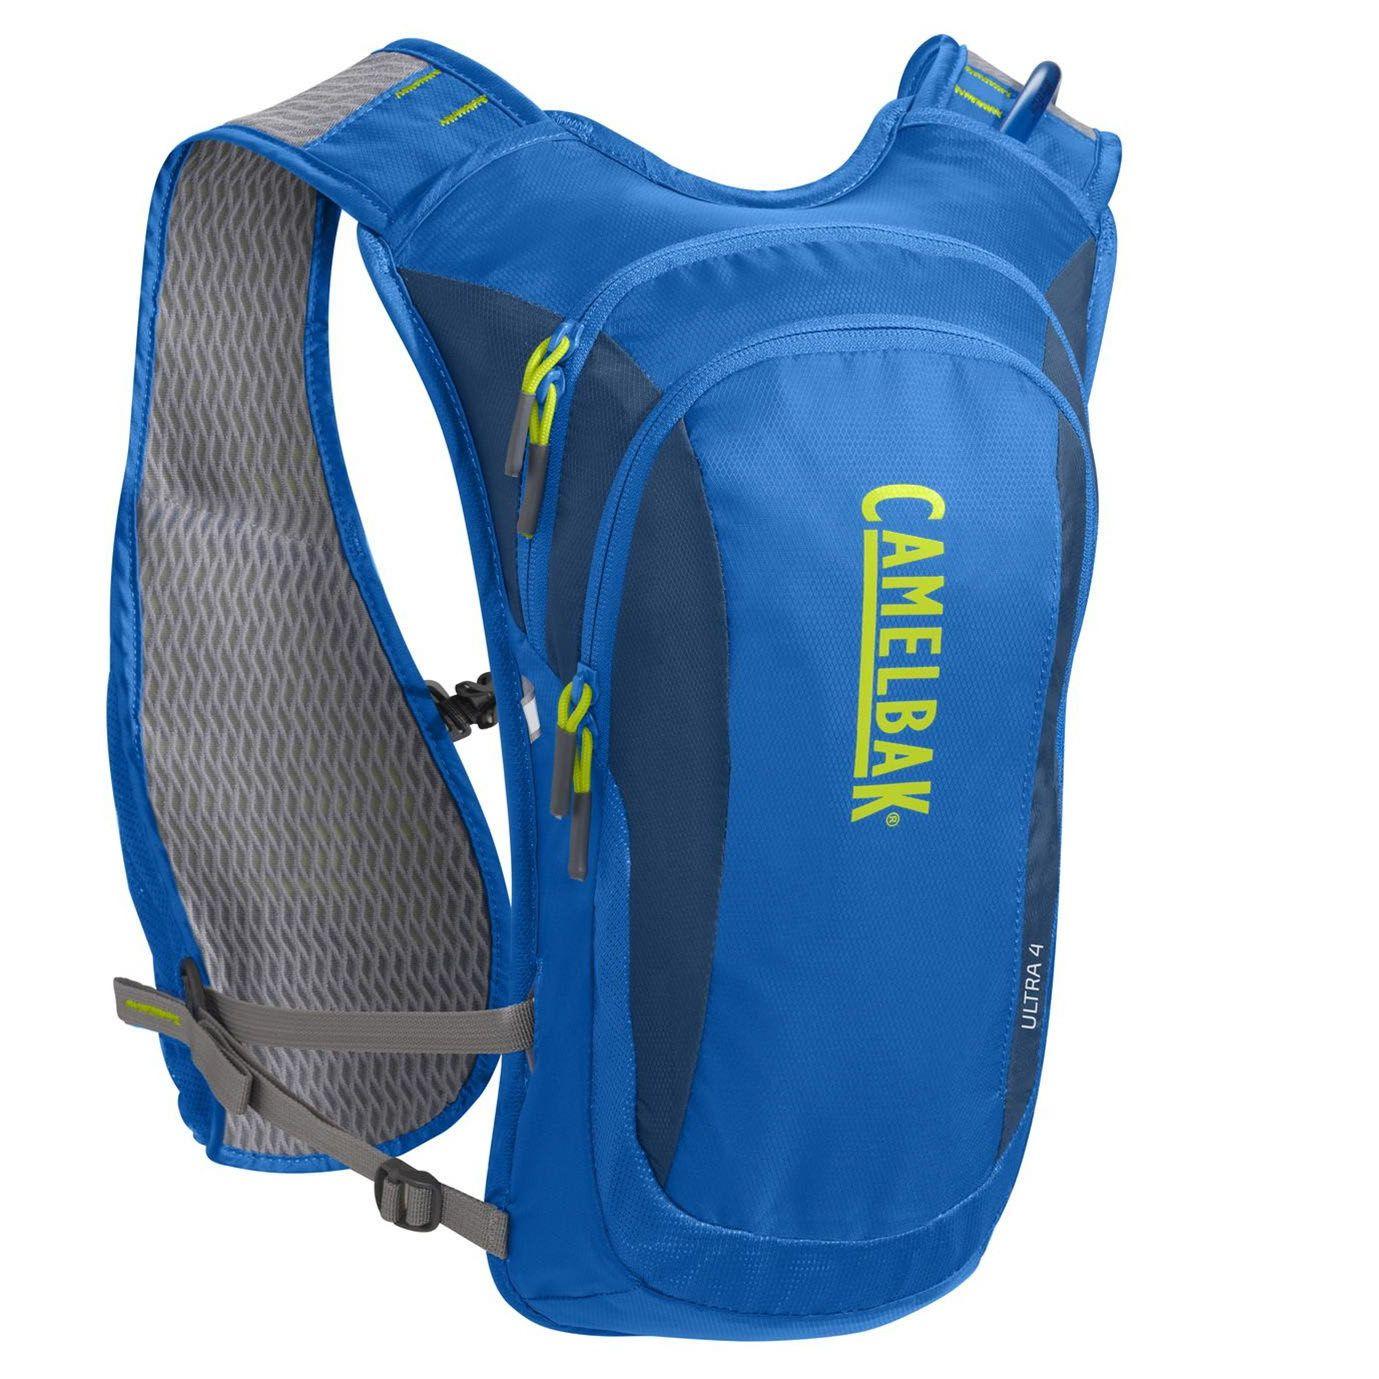 camelbak ultra 4 hydration running backpack